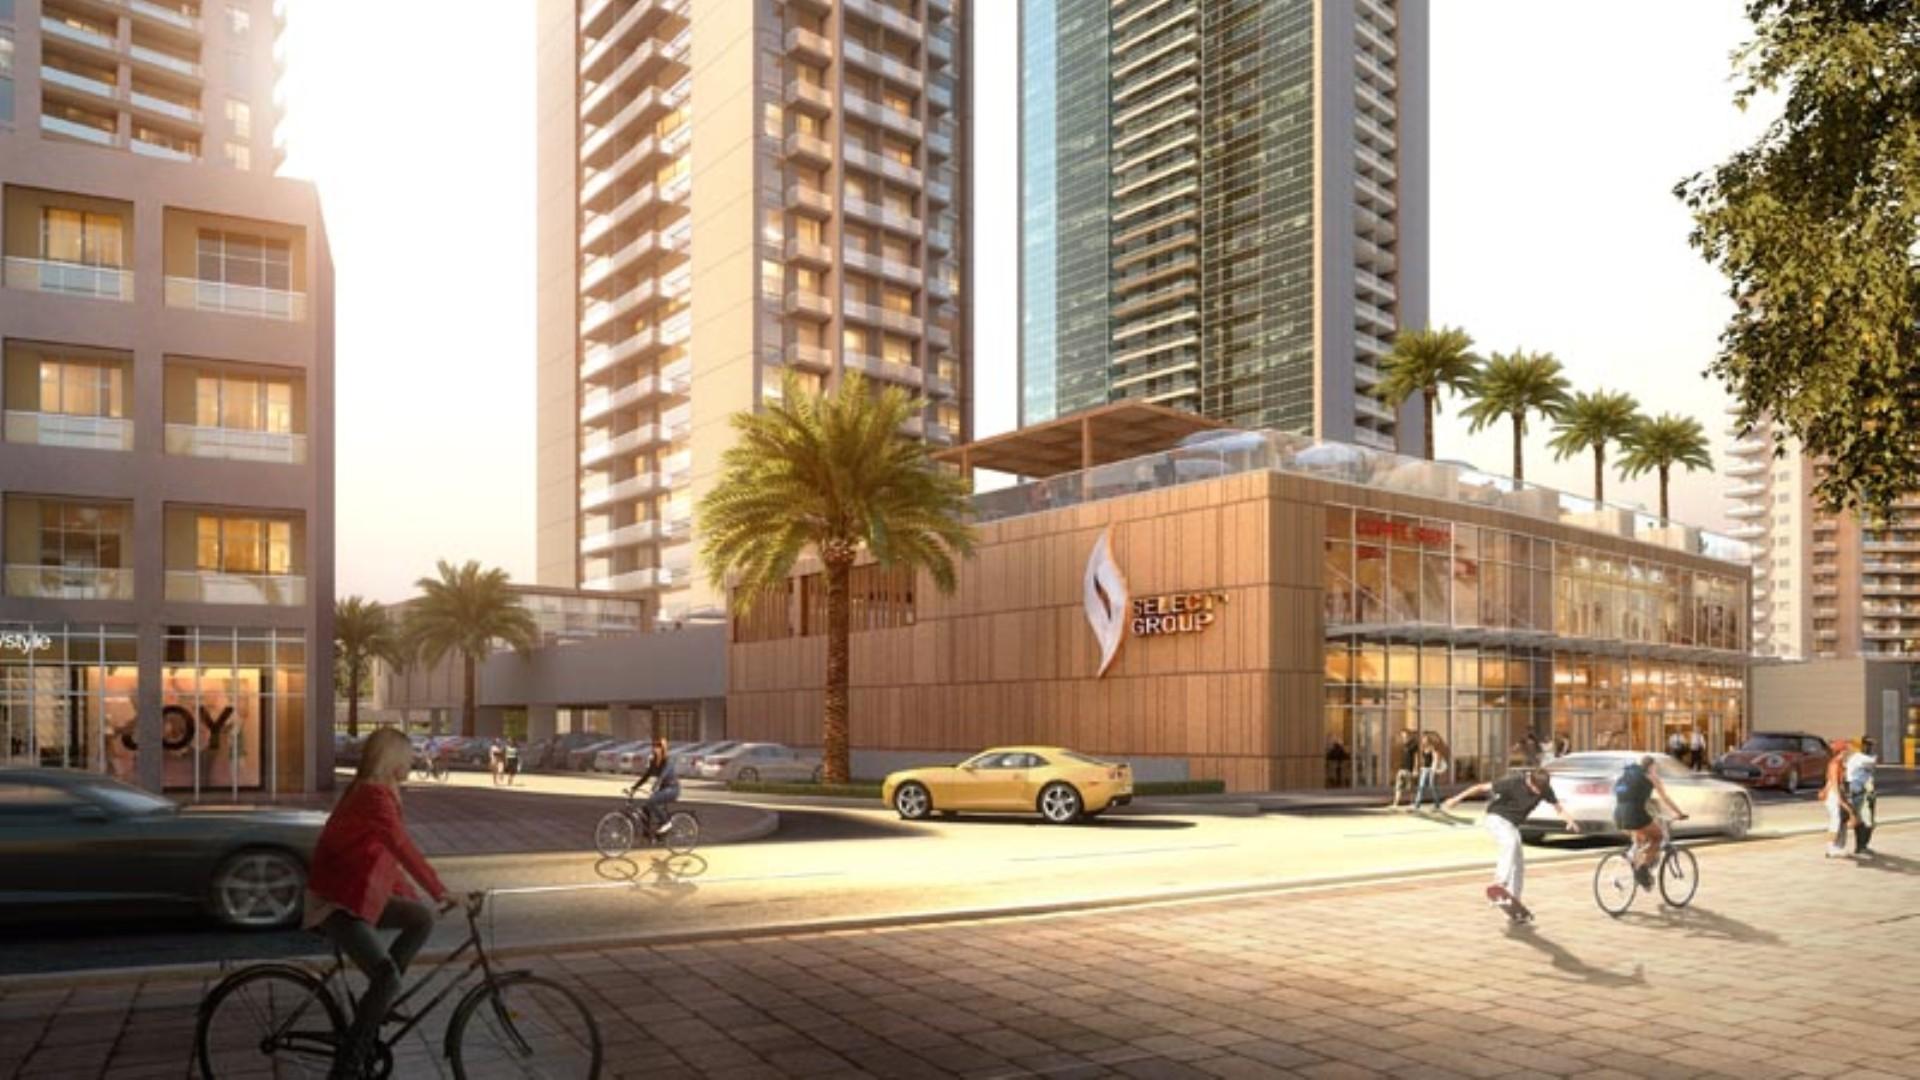 STUDIO ONE, Dubai Marina, UAE – photo 2